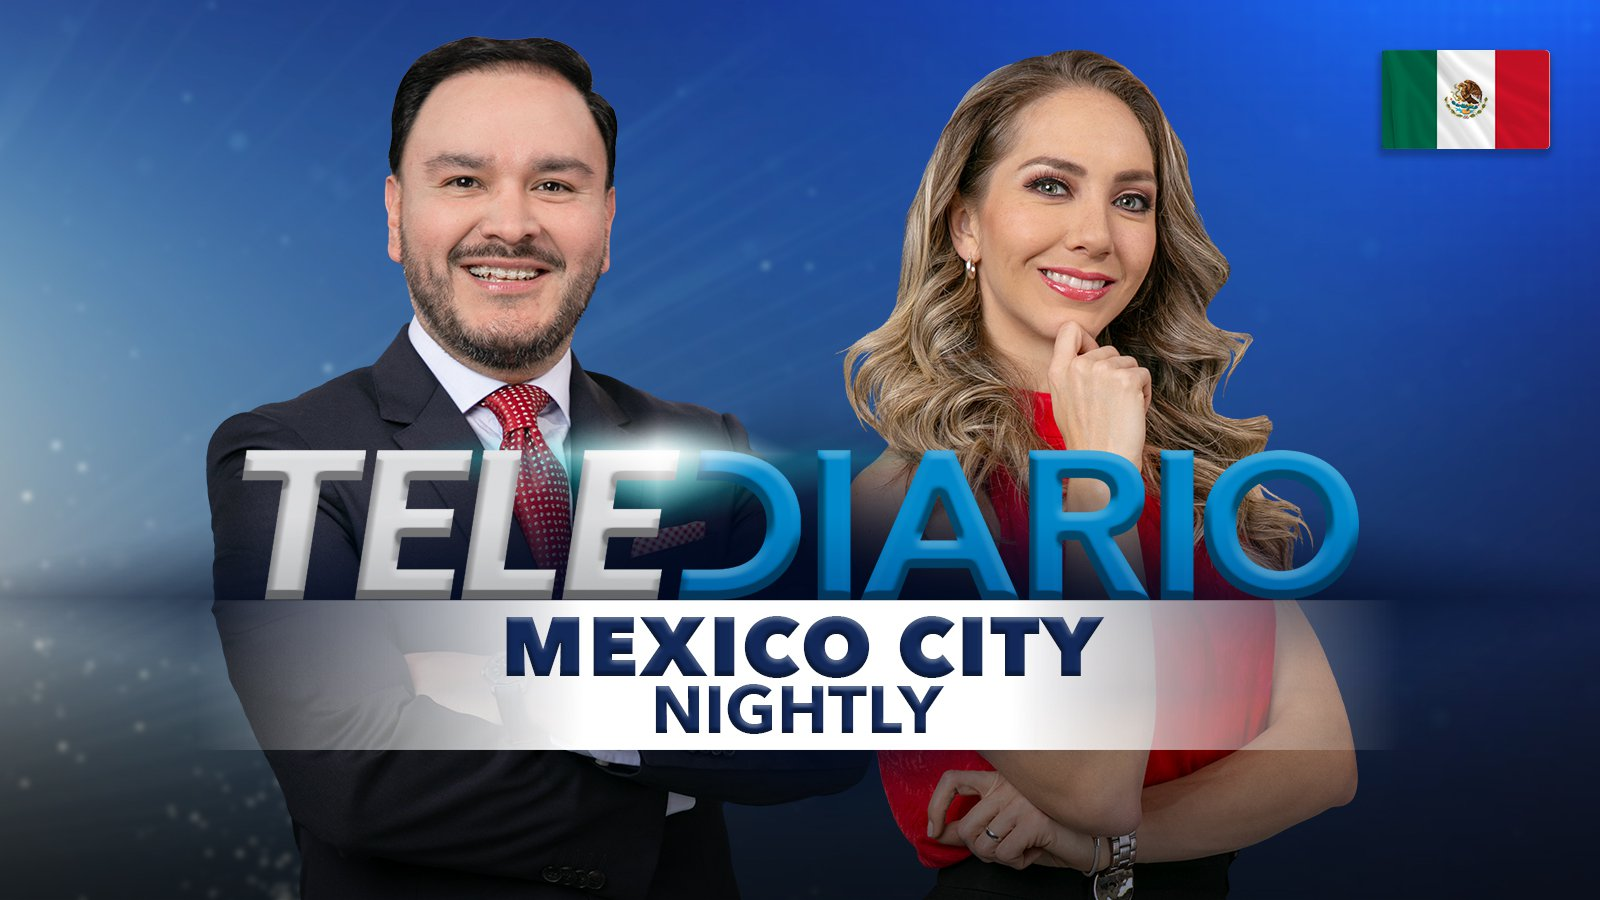 Nightly CDMX Telediario poster